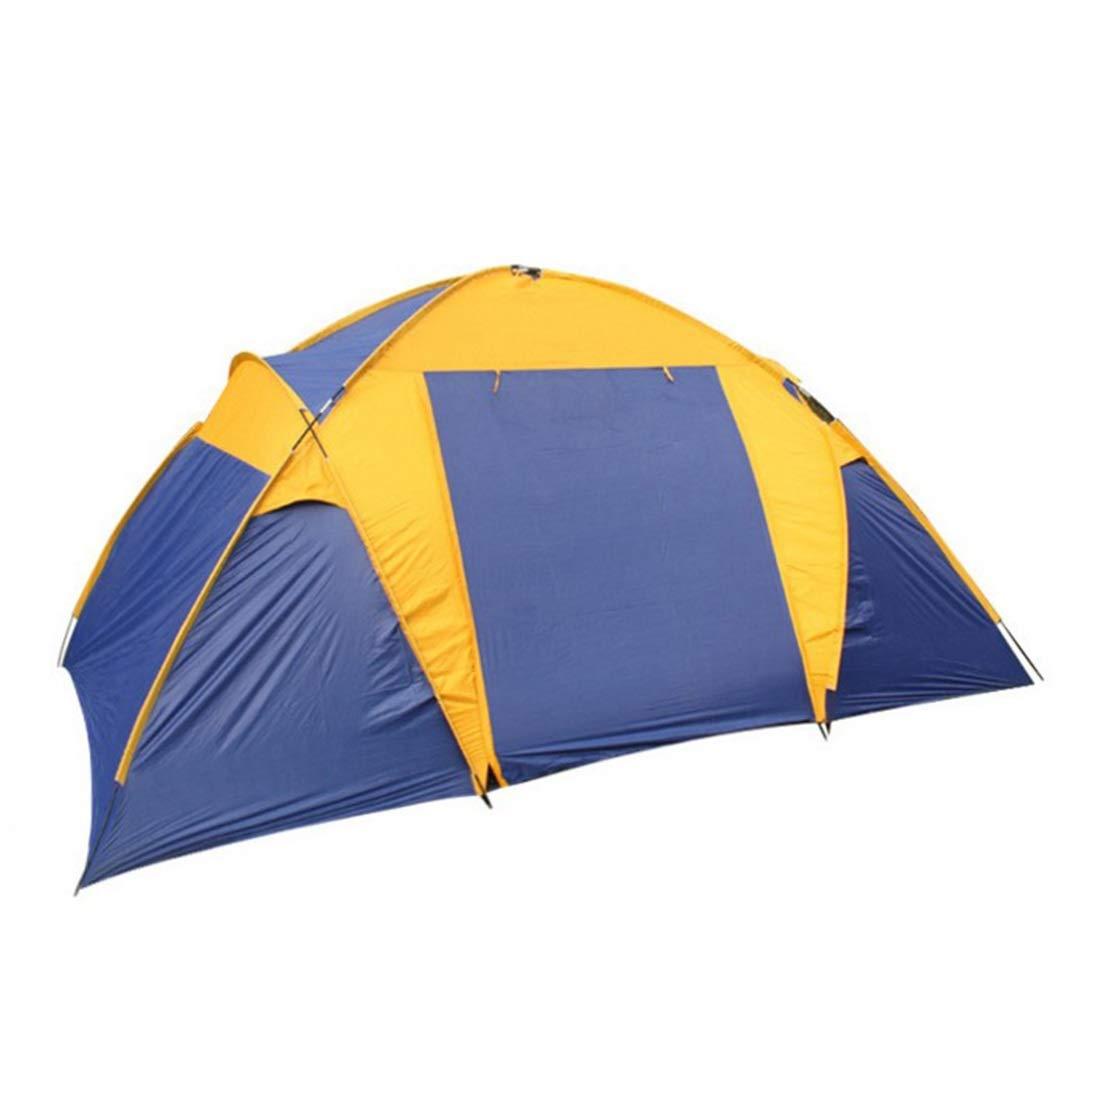 CUBCBIIS 屋外ツアー用の超軽量の1人用テント、二重防雨 (サイズ : 5-8P) 5-8P  B07N43Z4VC